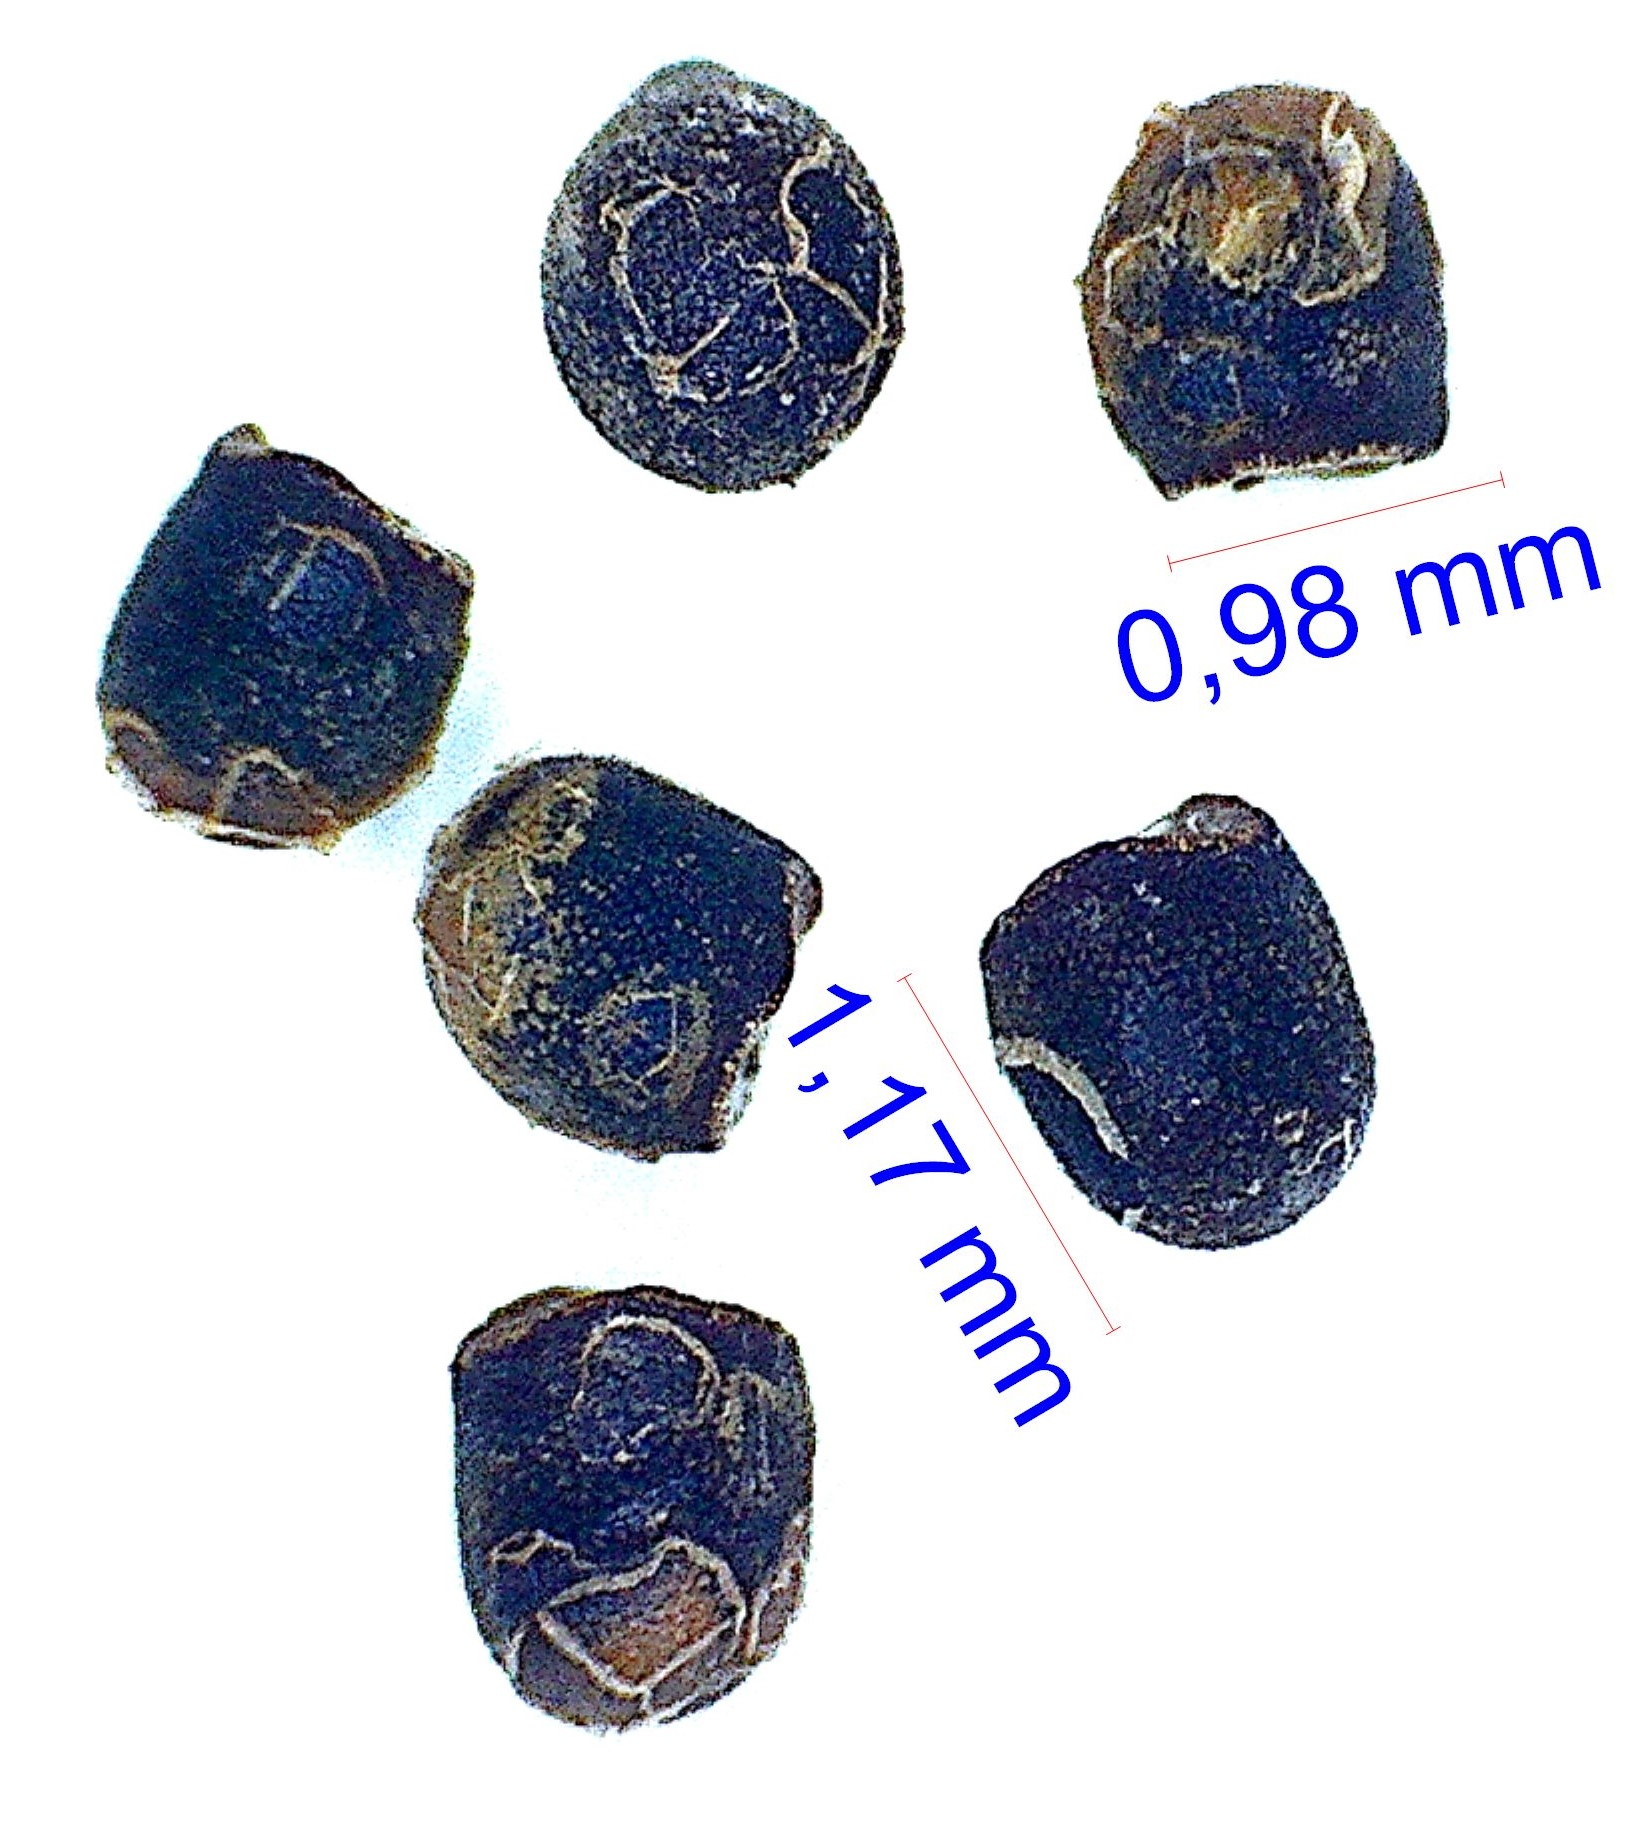 Gymnocalycium sindae JPR 92-36/89. © Joël Lodé/cactus-aventures.com